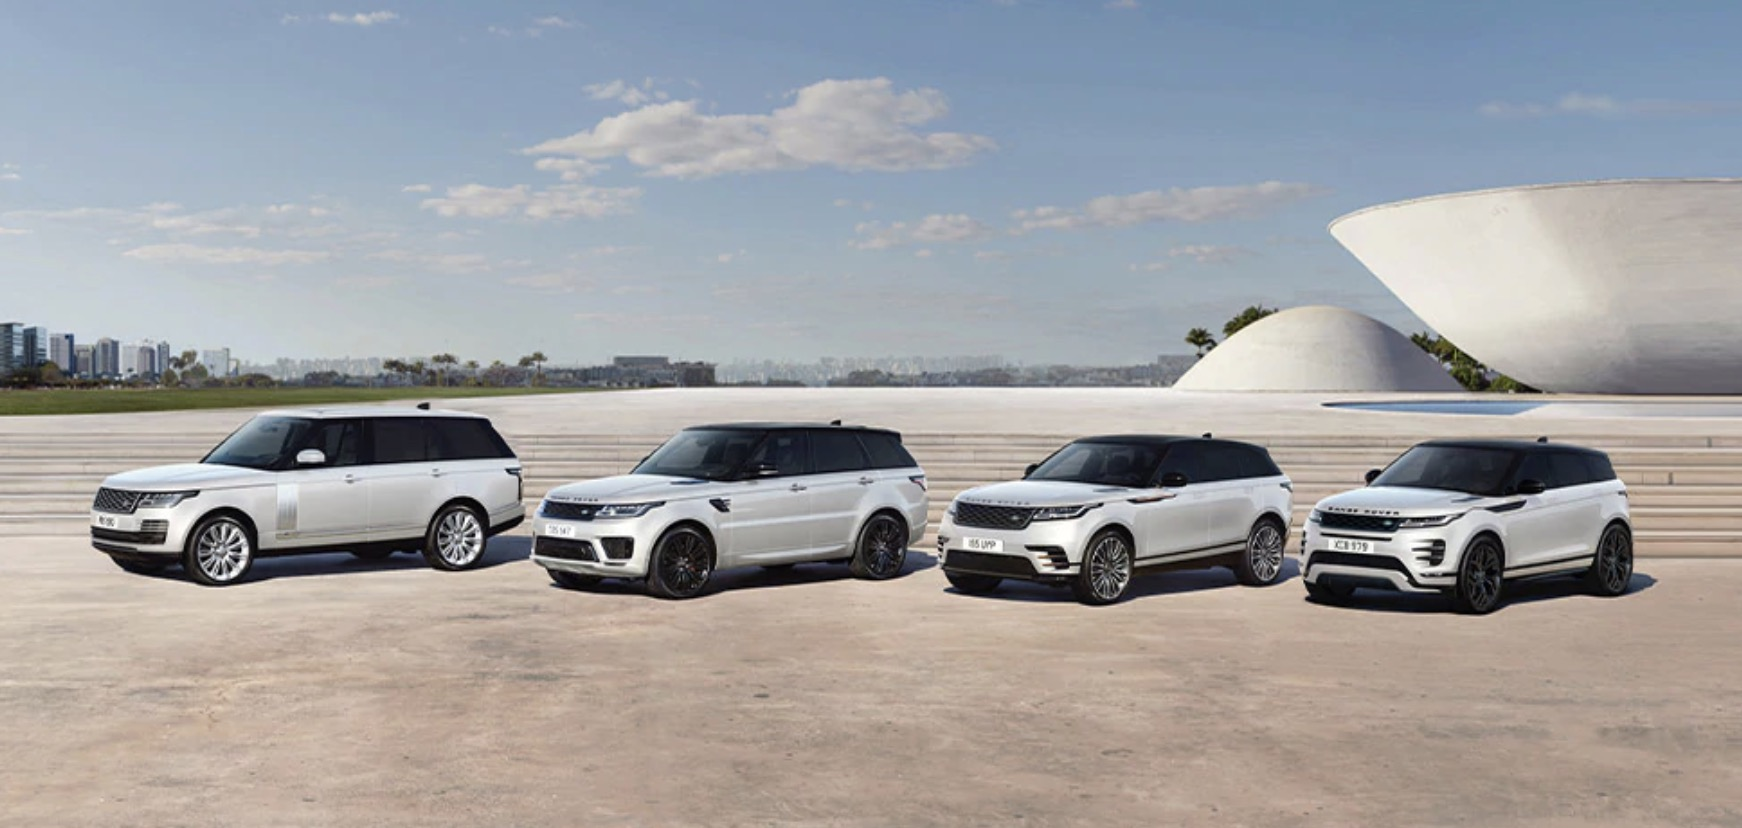 Xe Range Rover 2020 | Evoque, velar, Discovery, Sport, Thùng To, Giá Tốt Nhất | 0908045001